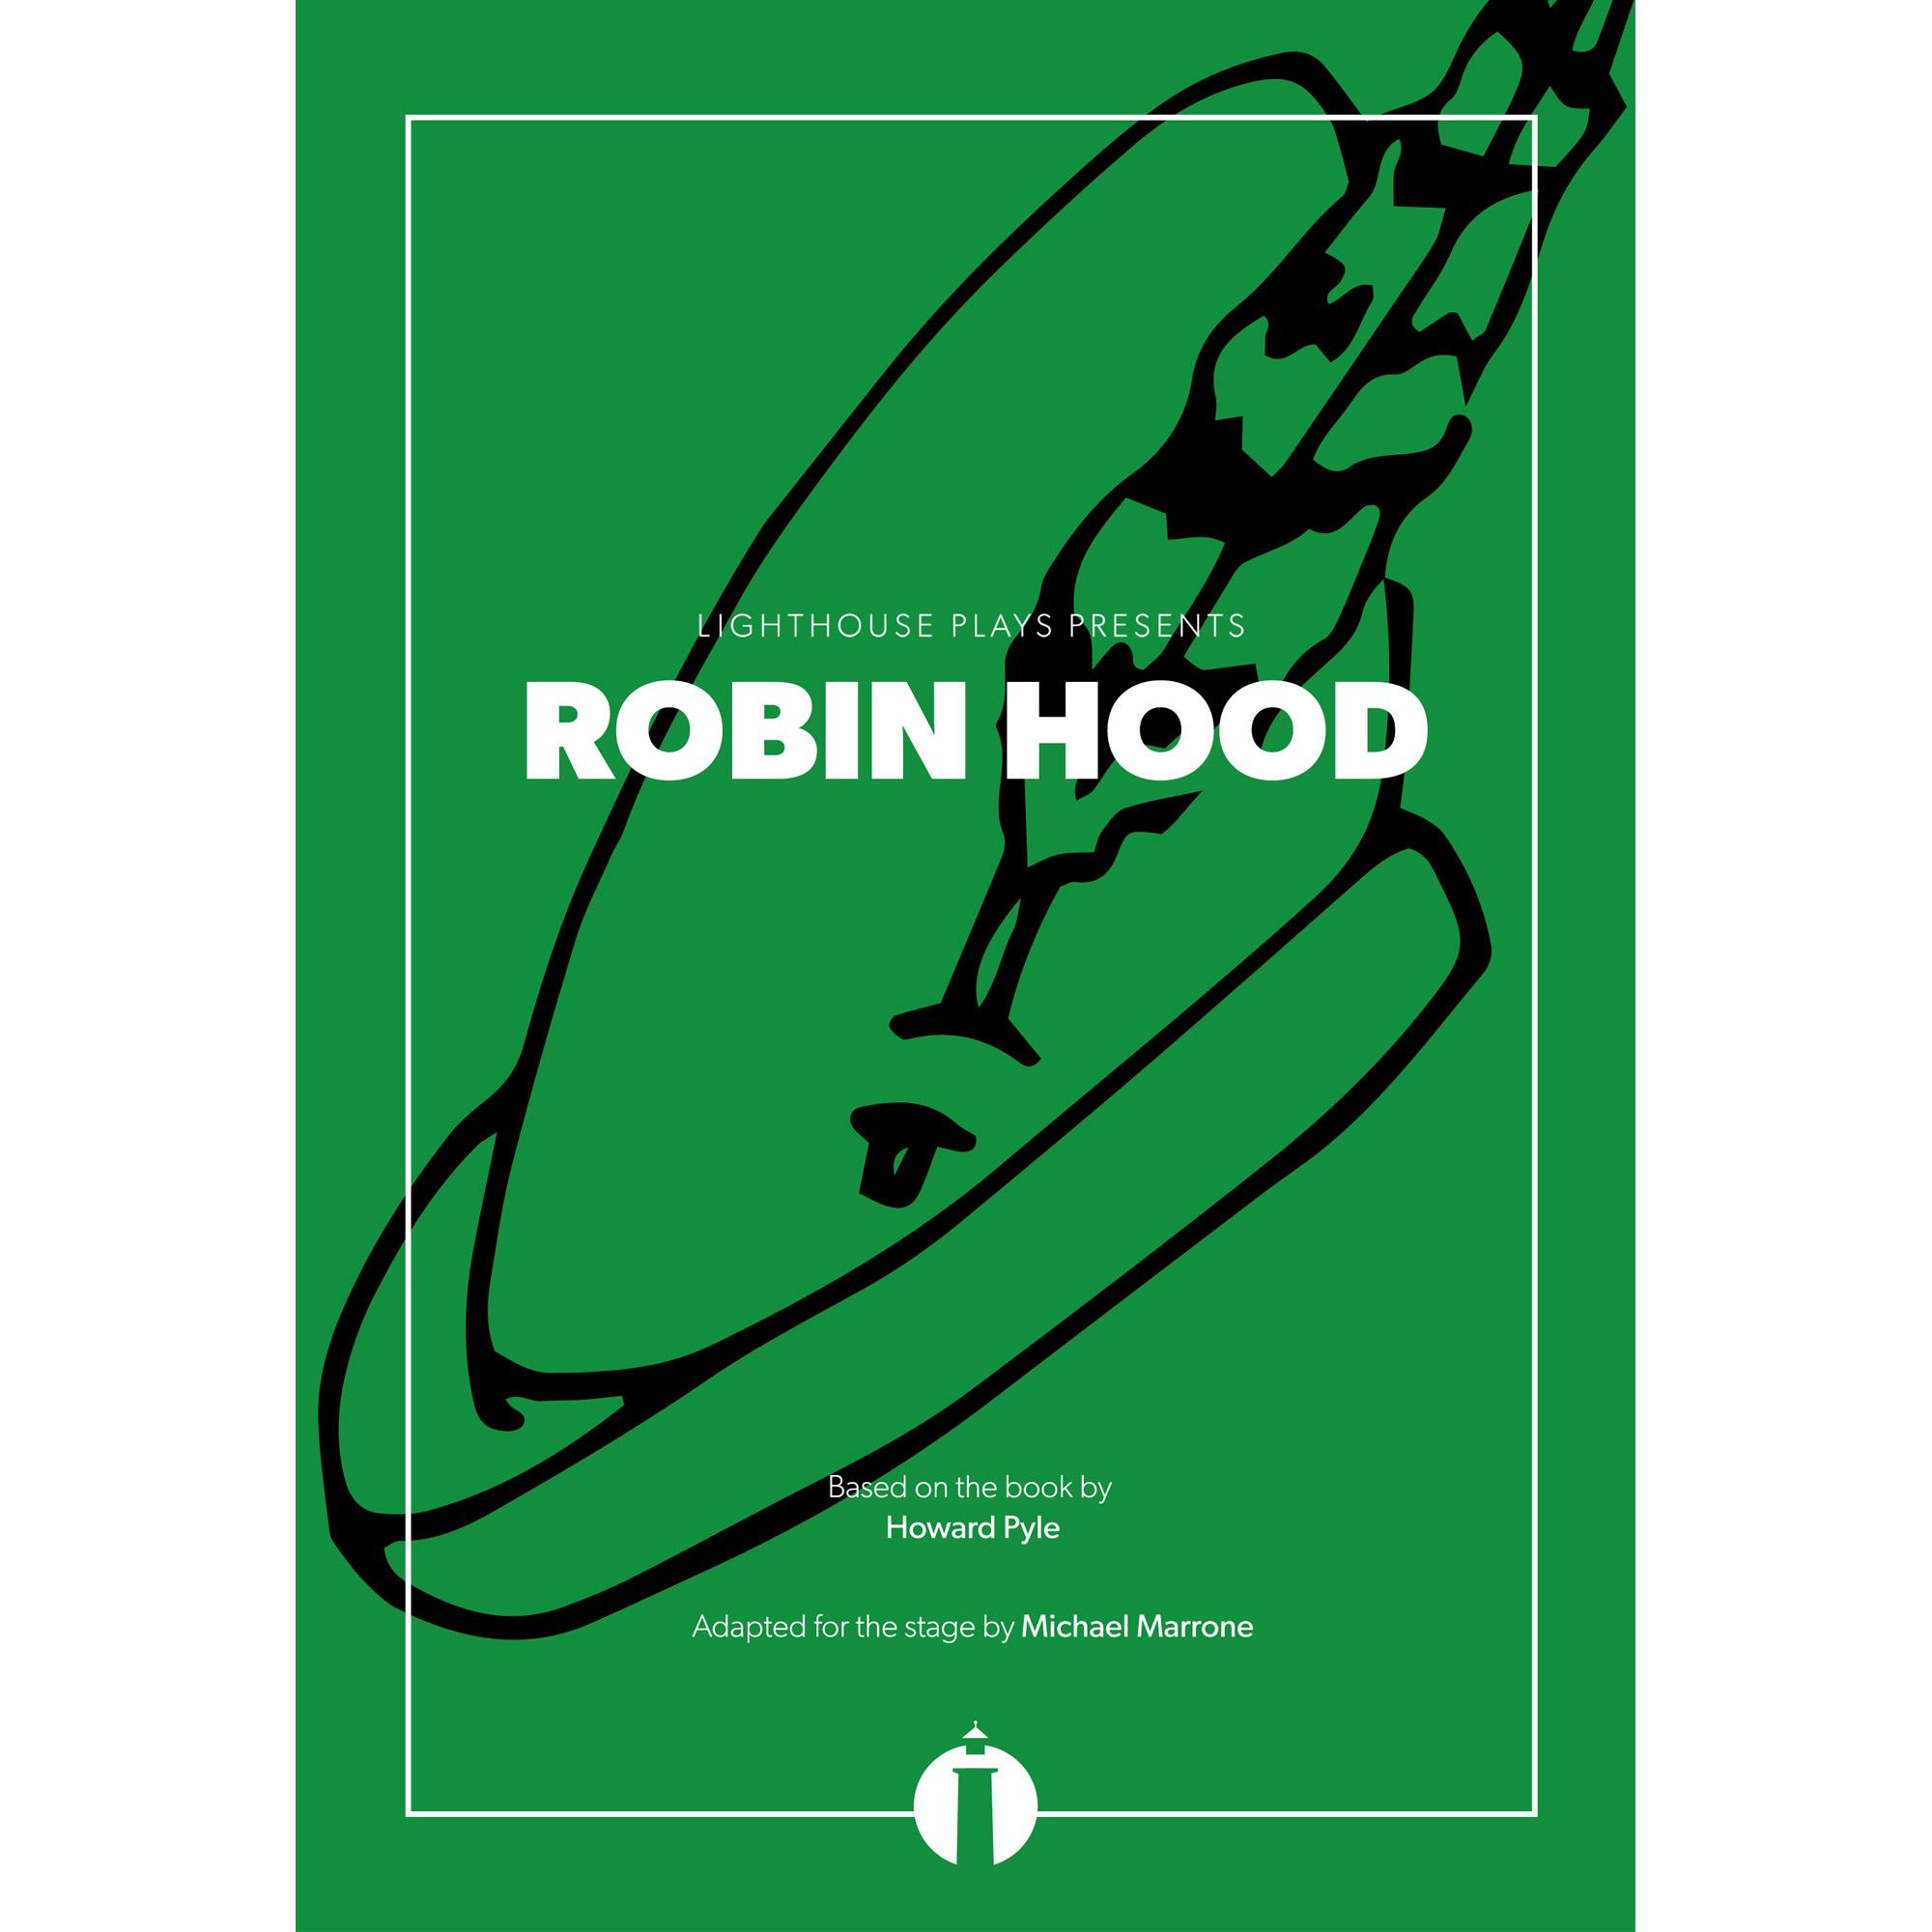 RobinHood.jpg